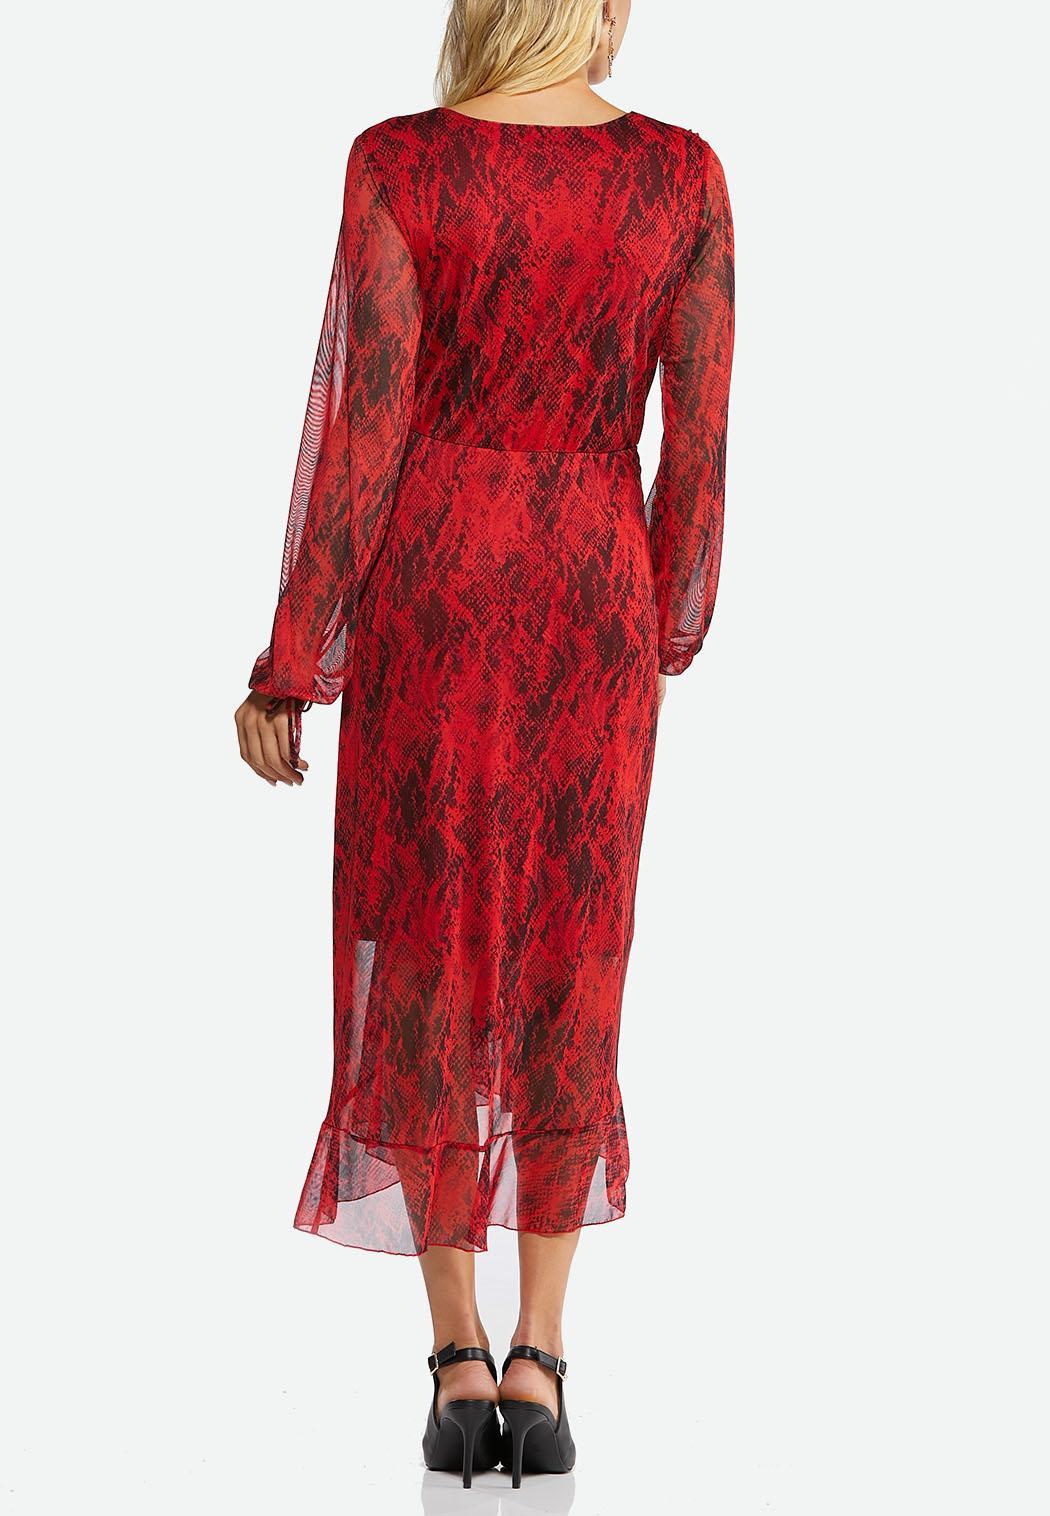 Snakeskin Print Faux Wrap Dress (Item #44465496)